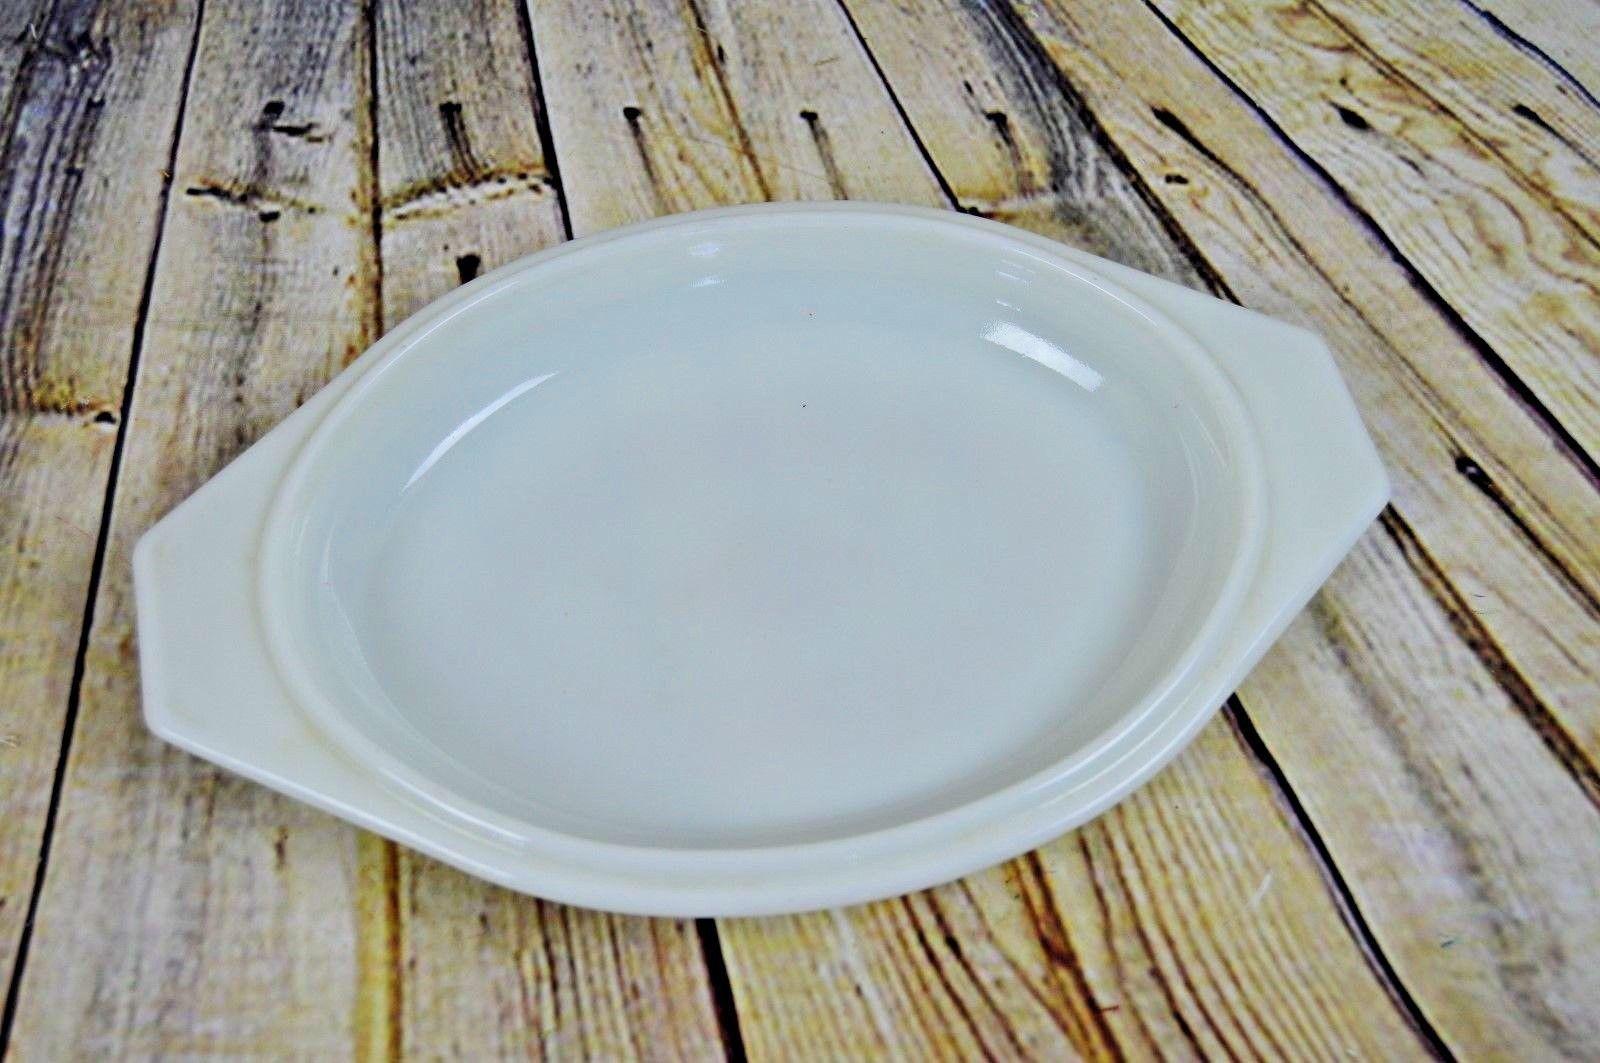 Vintage Pyrex Replacement Casserole Dish Cover 943 C17